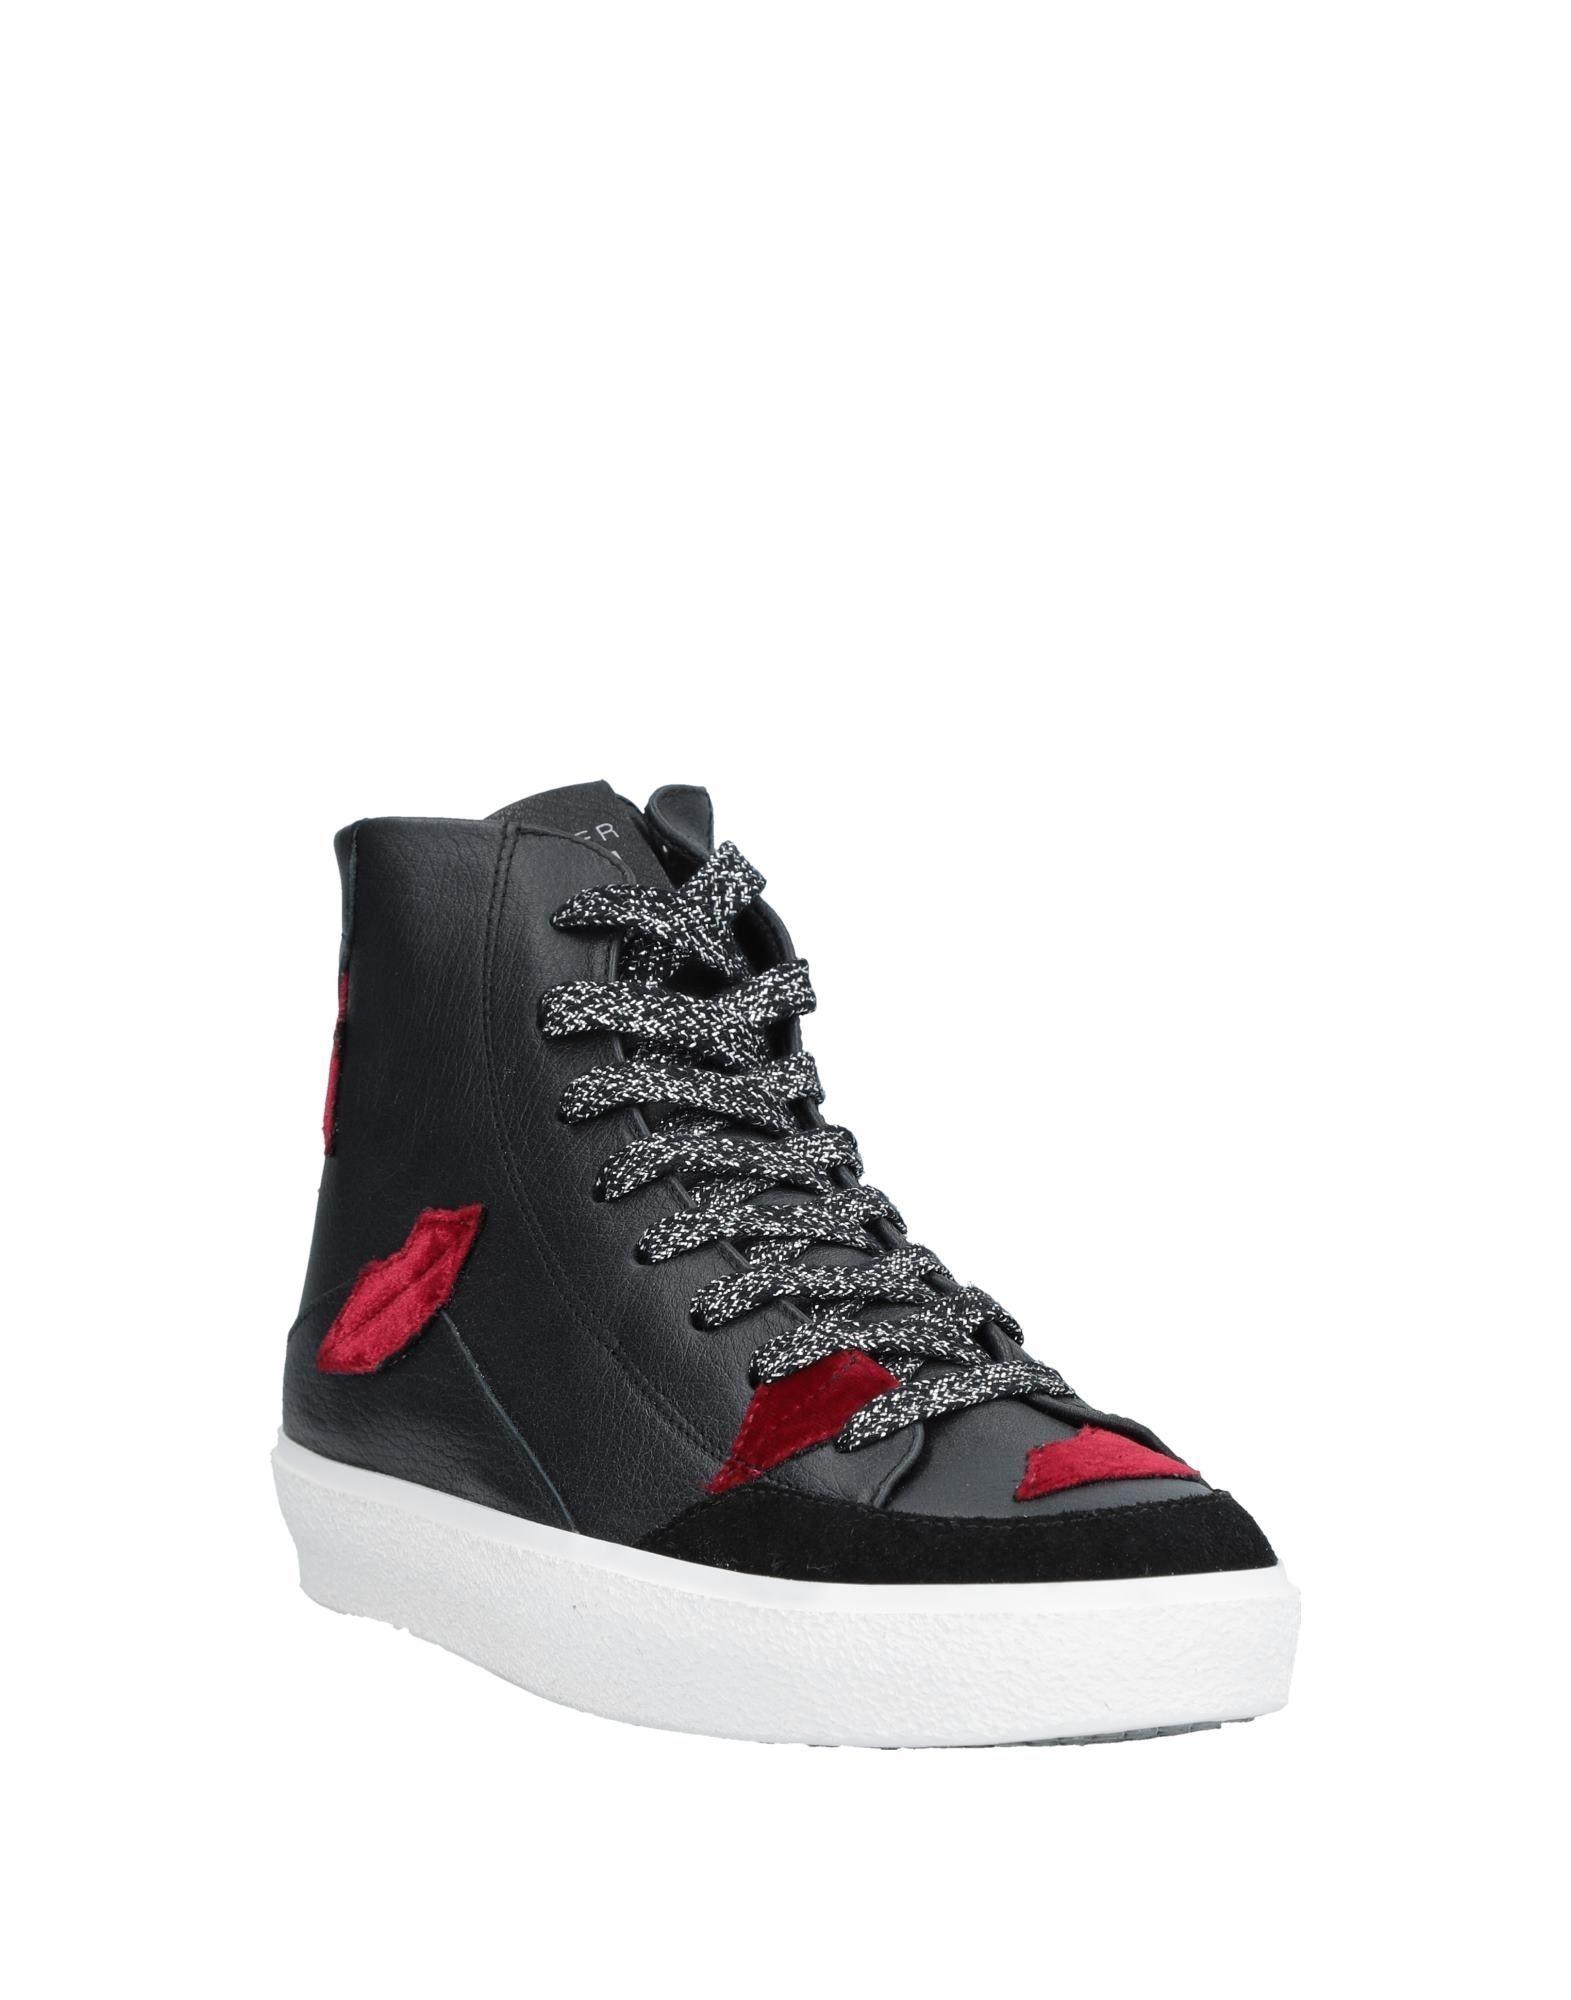 Crown Leather Crown  Sneakers Damen  11532050IP 0a7e5e